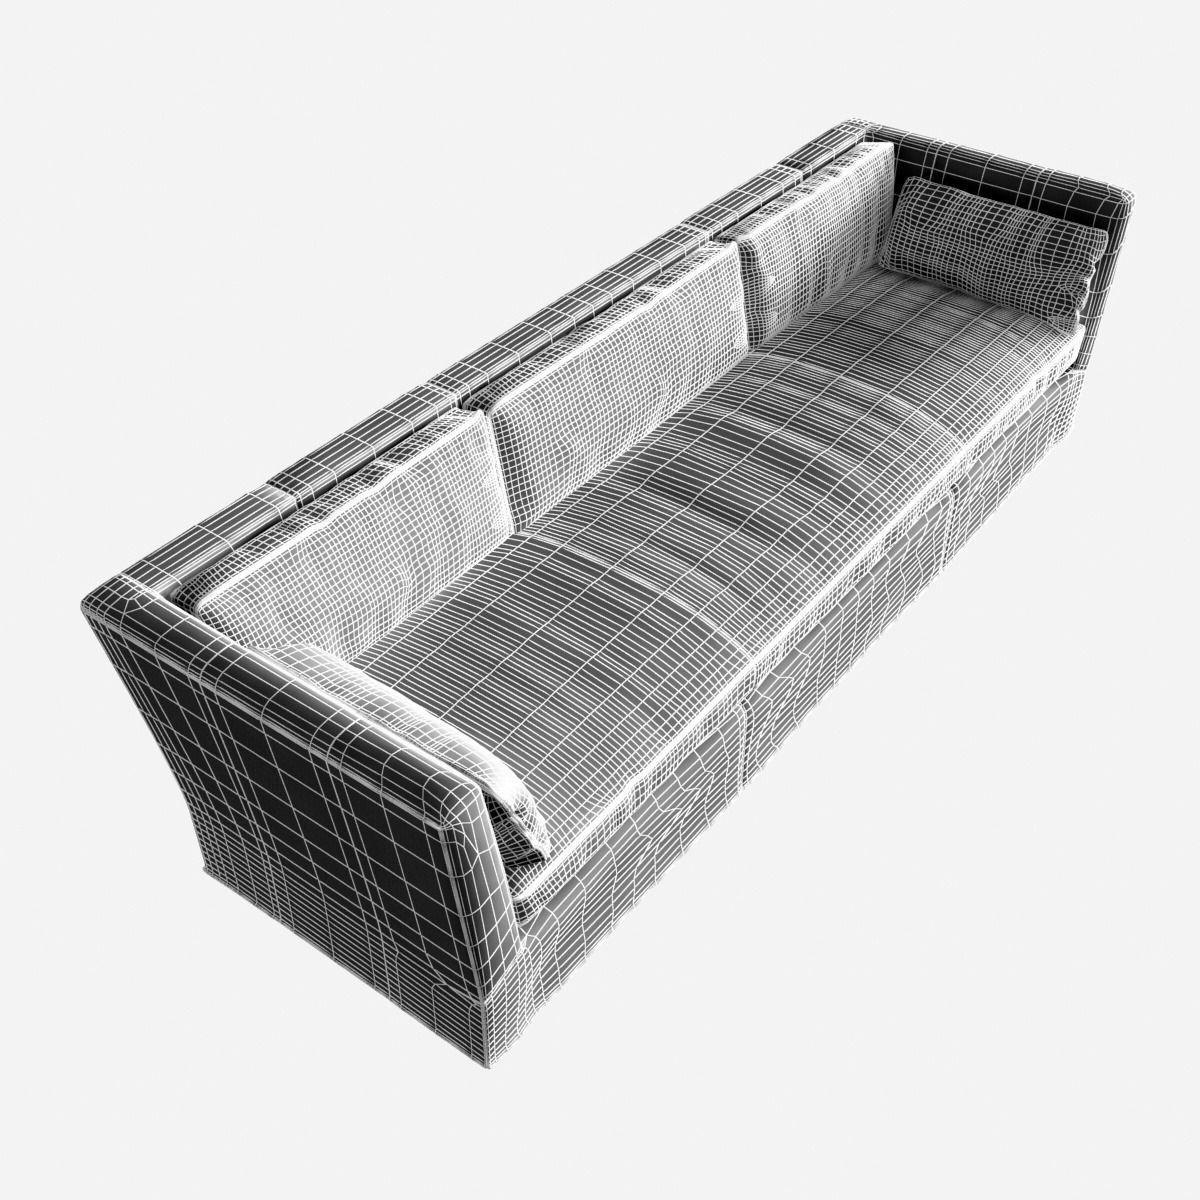 belgian shelter arm sofa grey 3 seater dfs restoration hardware leather 3d